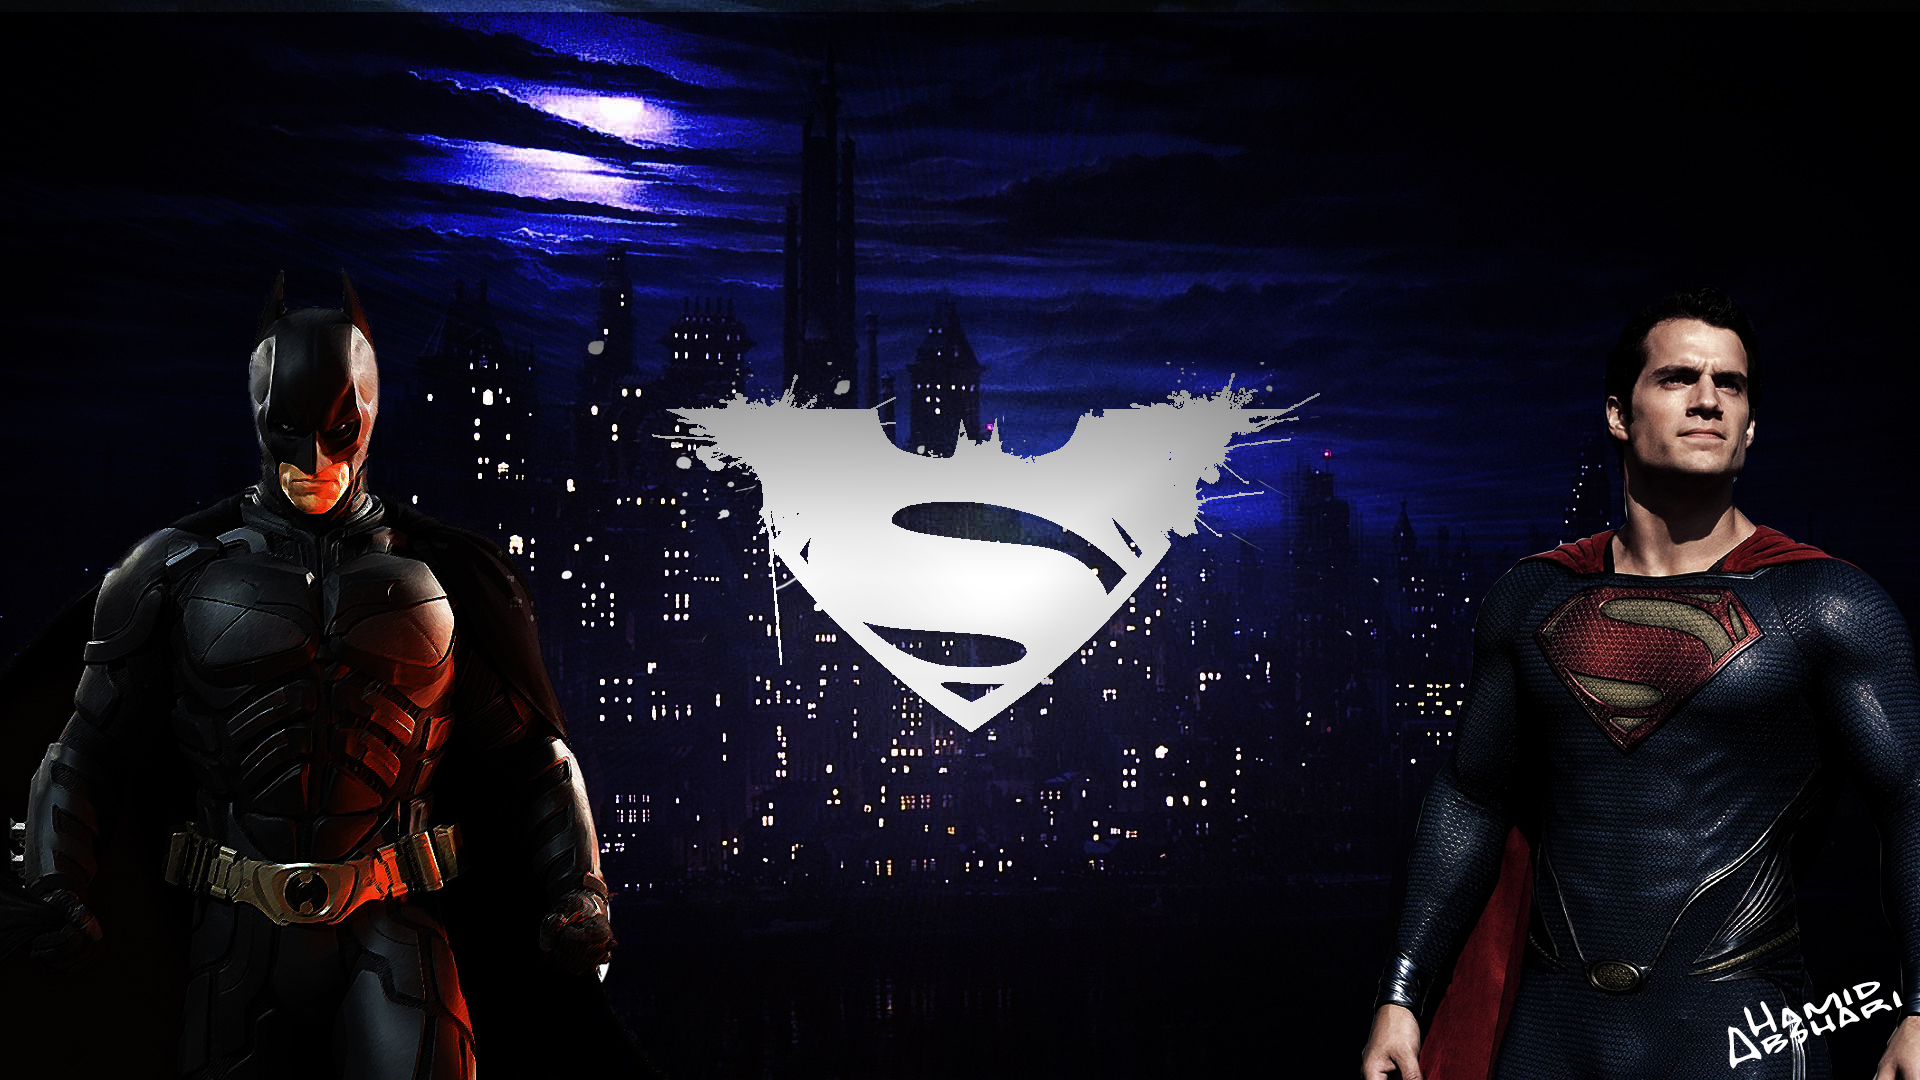 batman vs superman wallpaper by hamidabshari fan art wallpaper movies 1920x1080